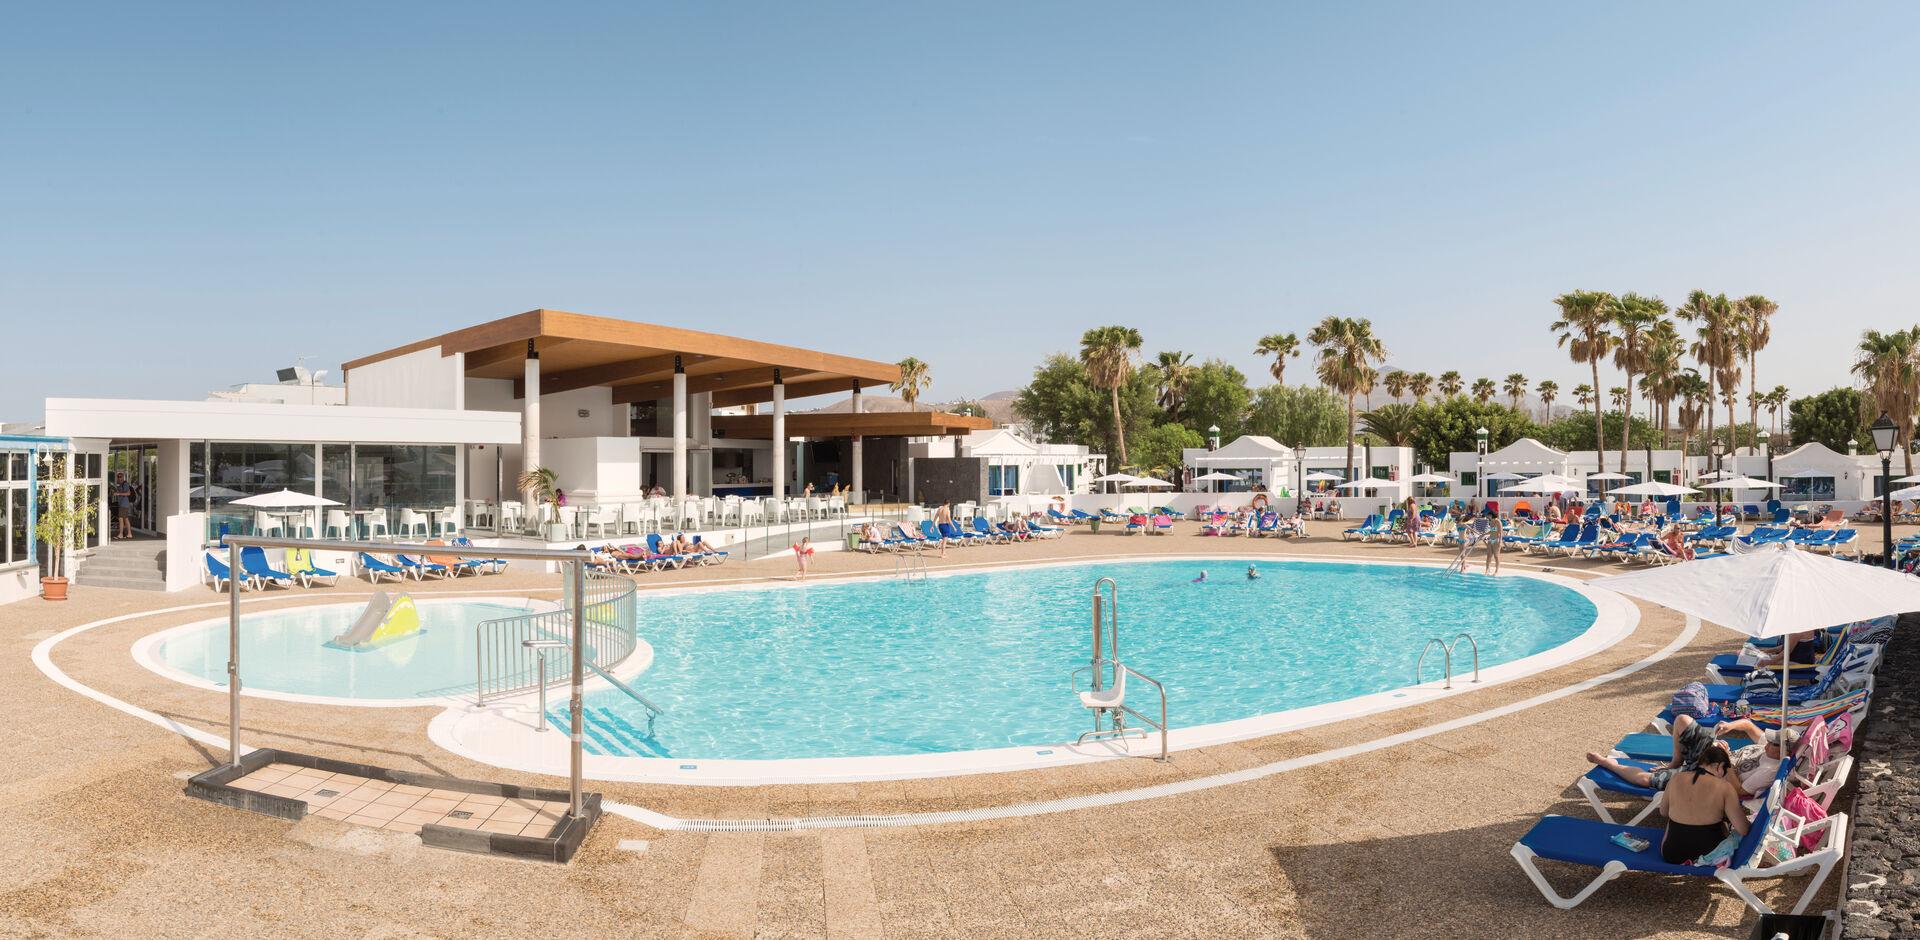 Séjour Lanzarote - Hyde Park Lane - 3*